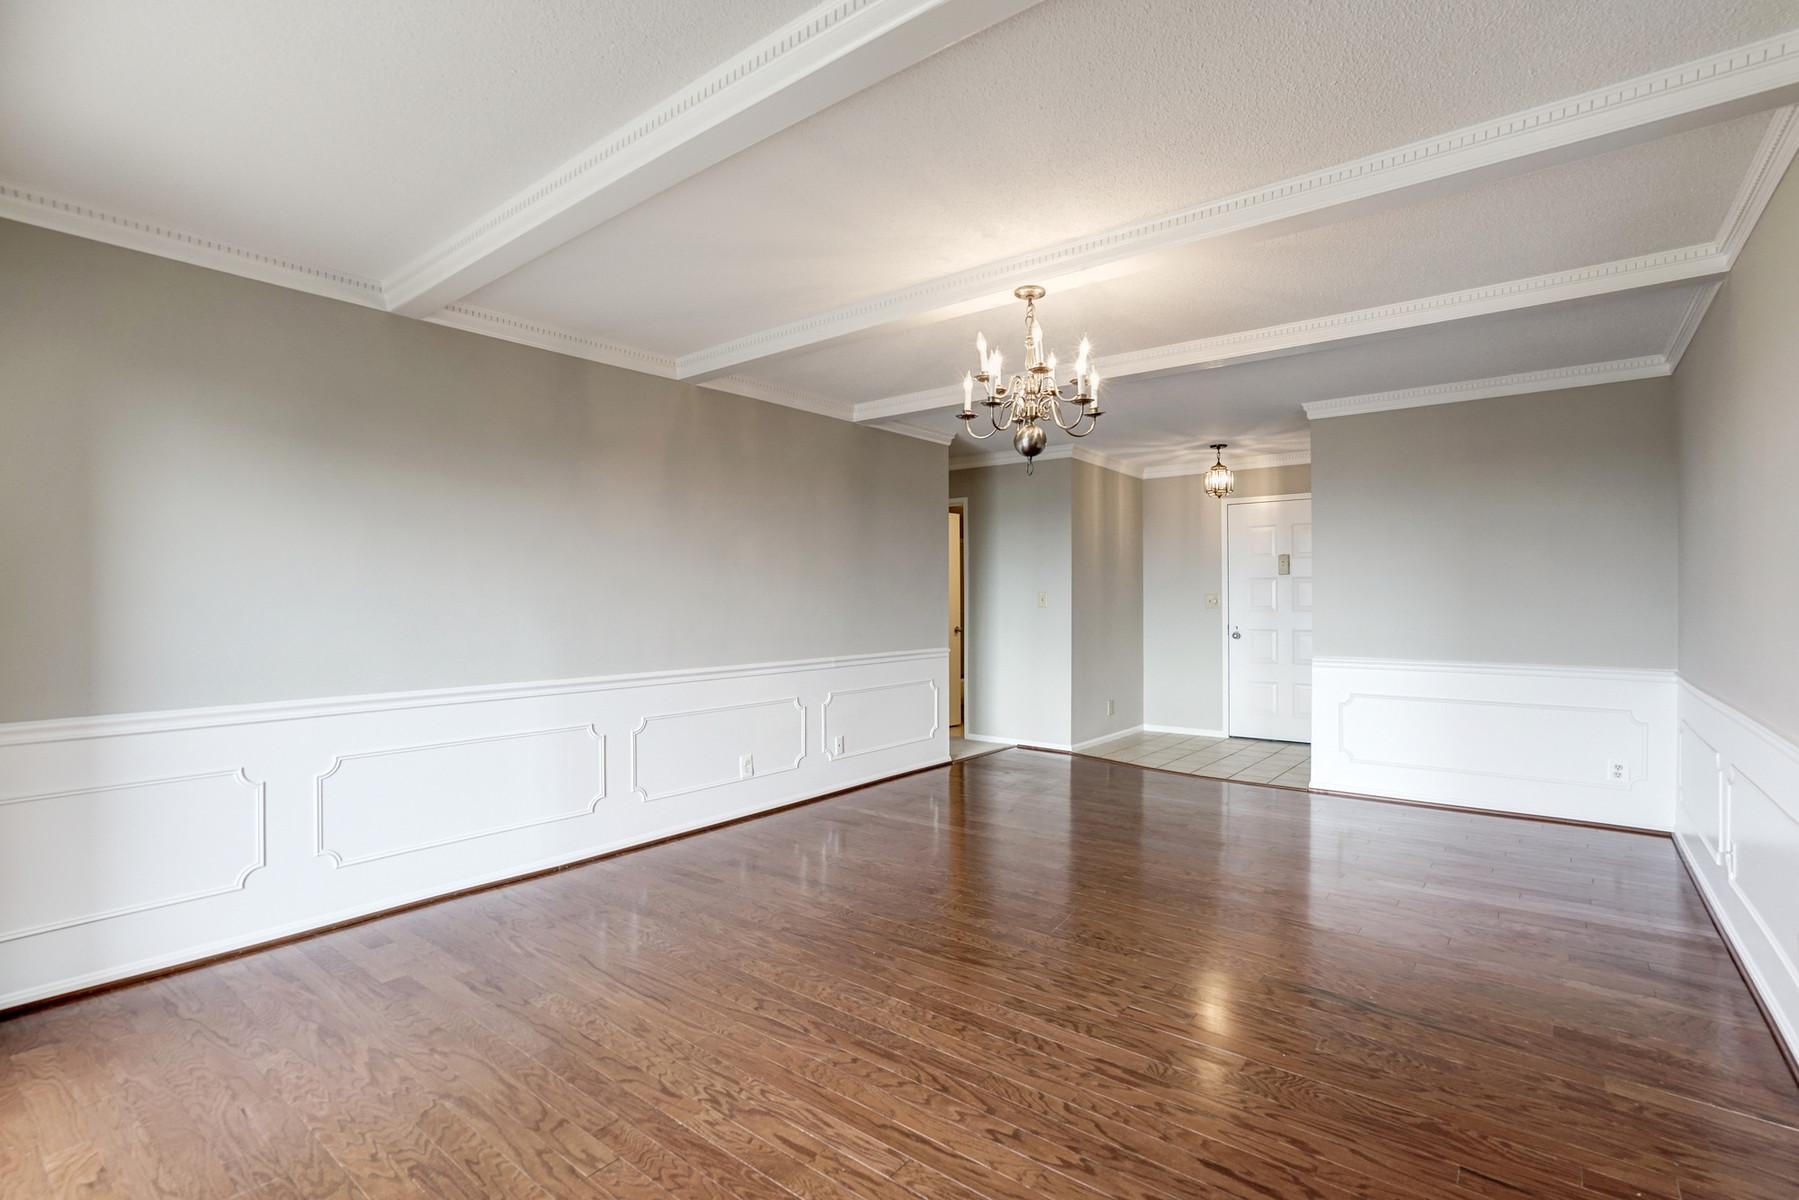 Additional photo for property listing at The Rotonda 8340 Greensboro Dr 1021 McLean, Virginia 22102 Estados Unidos